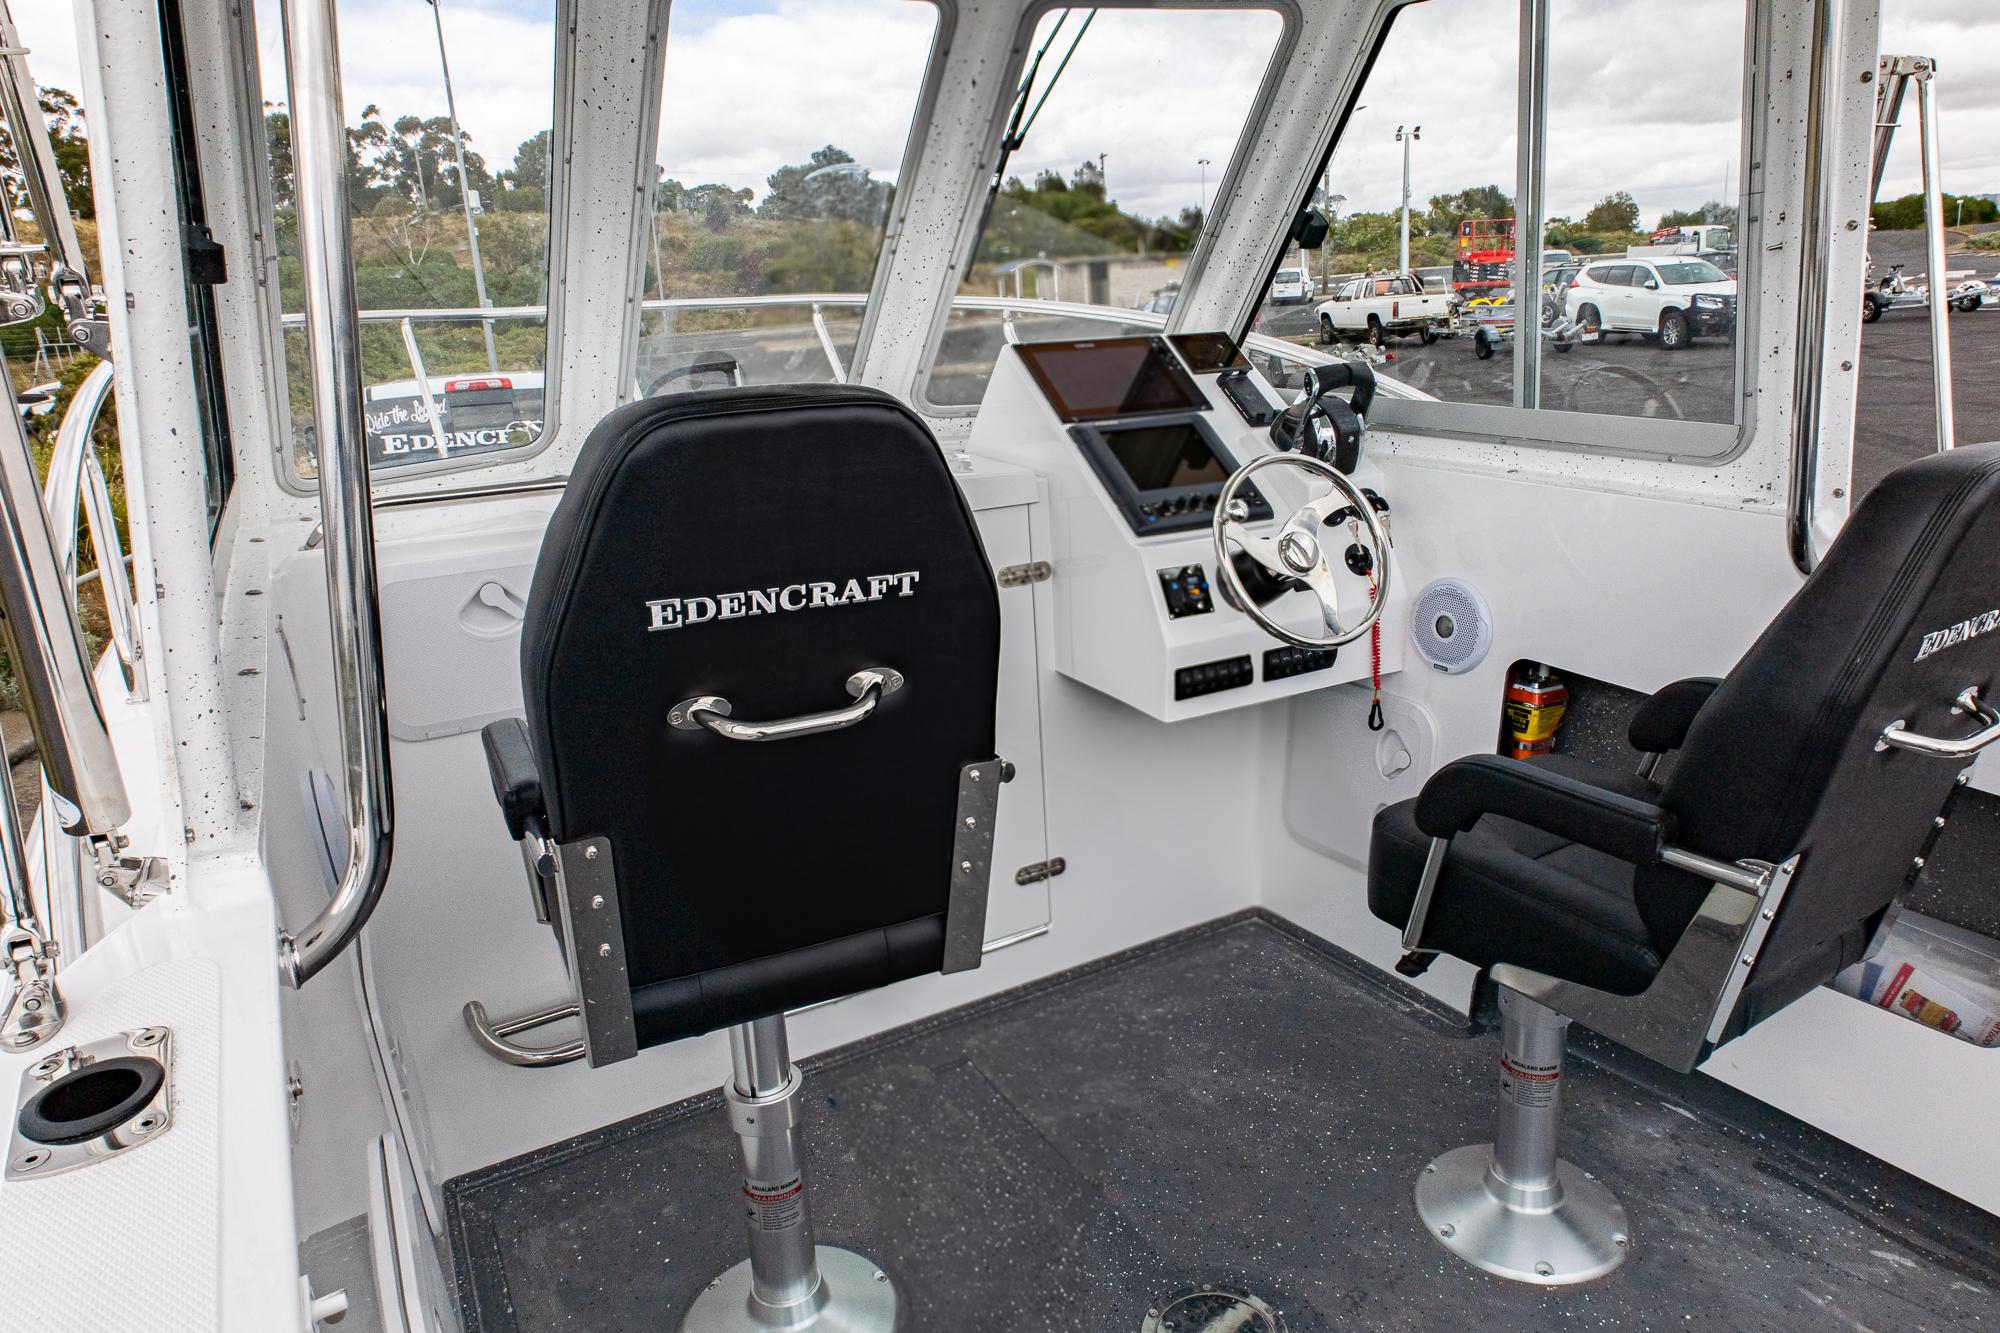 Edencraft 233 Formula dash and deck layout